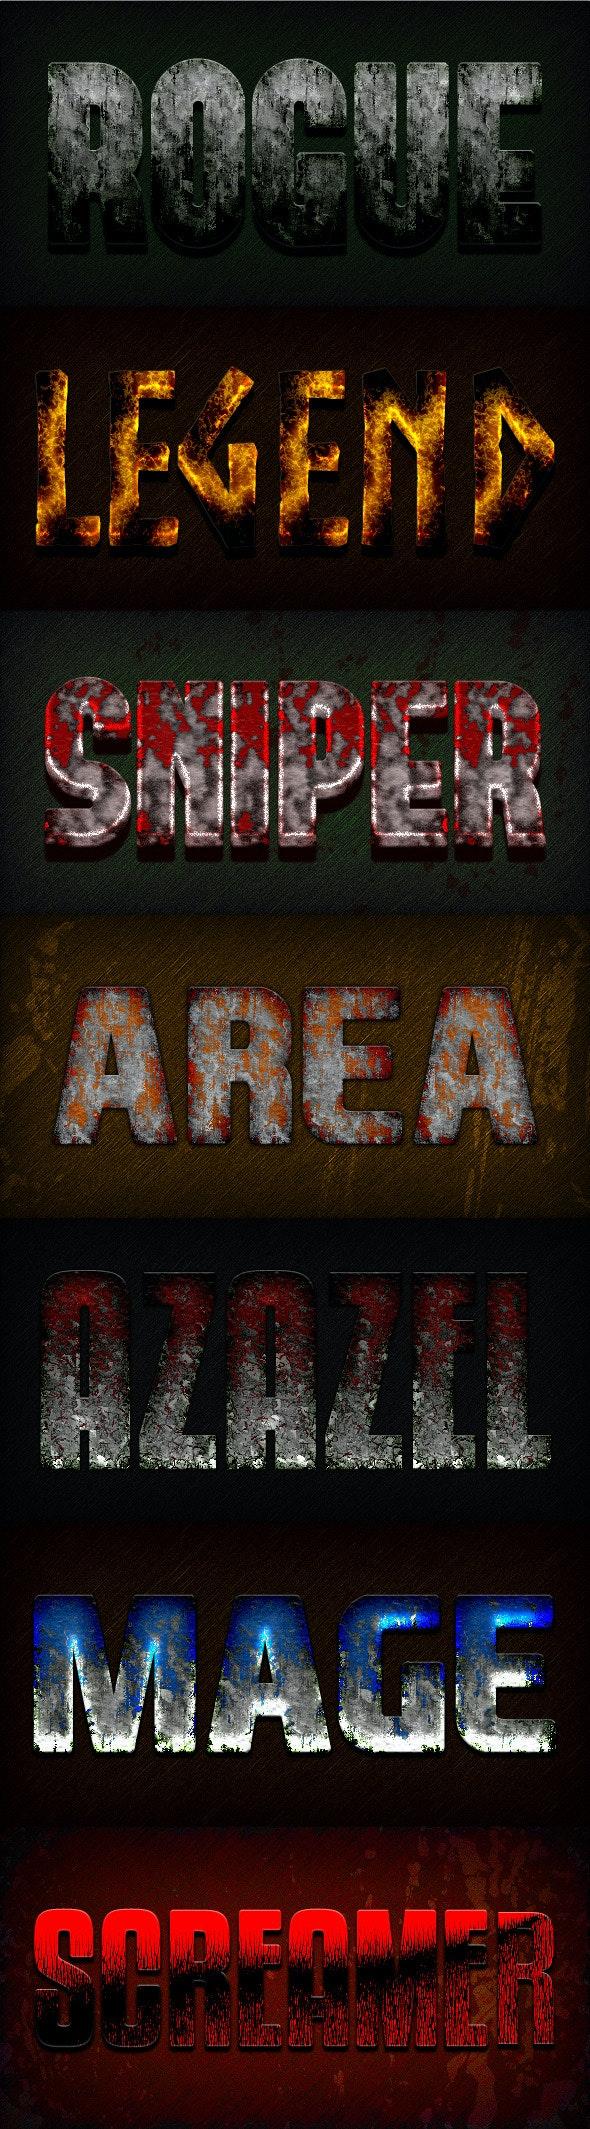 Photoshop Text Styles / Epic Gamer Vol.2 - Styles Photoshop